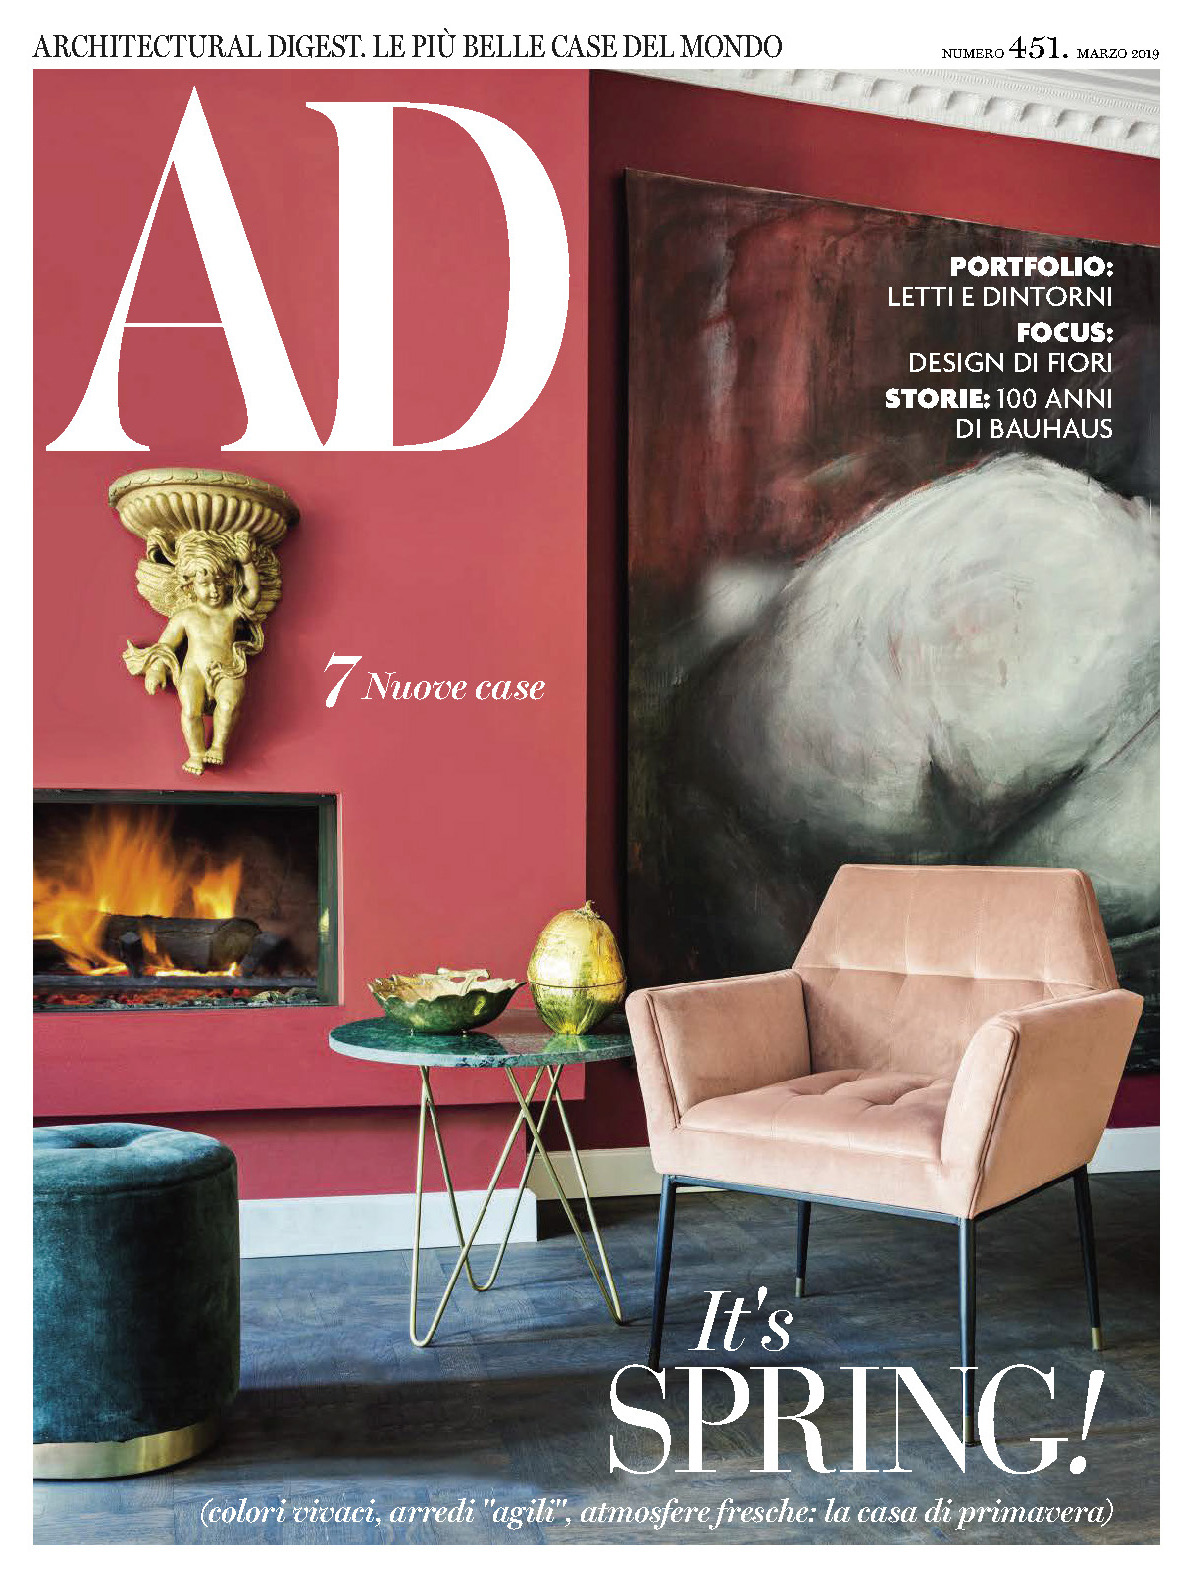 《AD》意大利版室内室外设计杂志2019年03月号